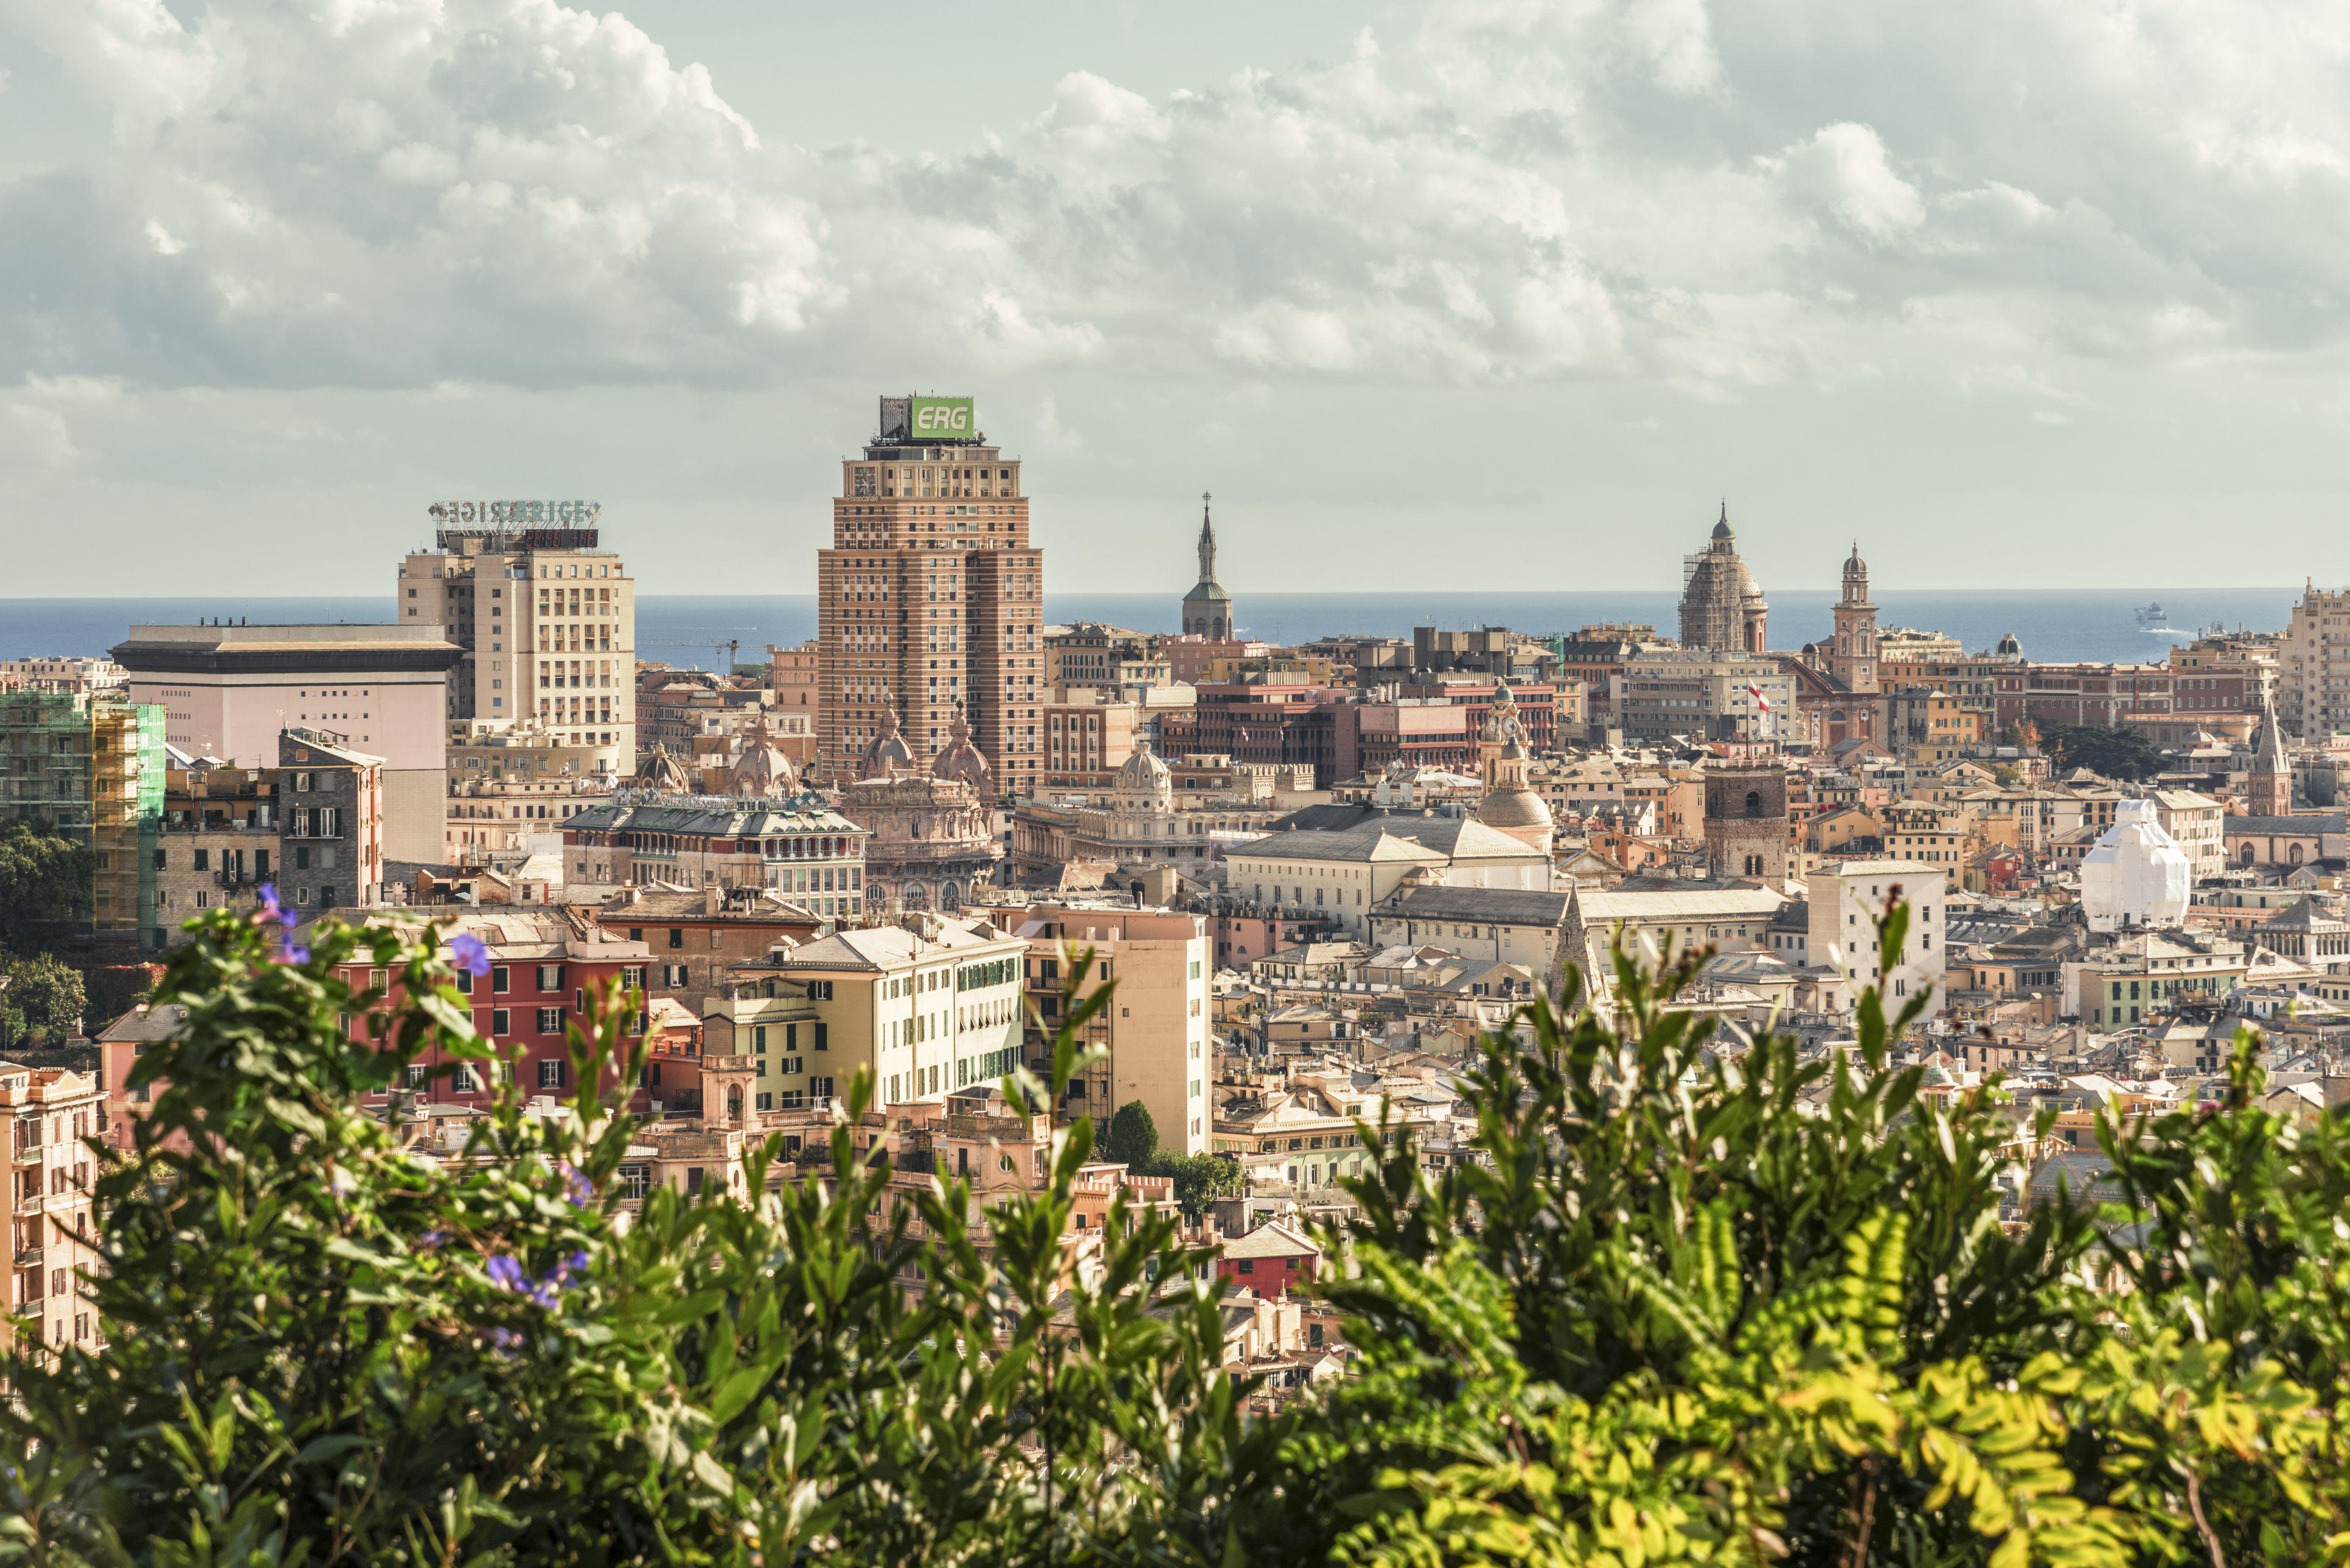 Italy, Genoa, cityscape as seen from Corso Firenze